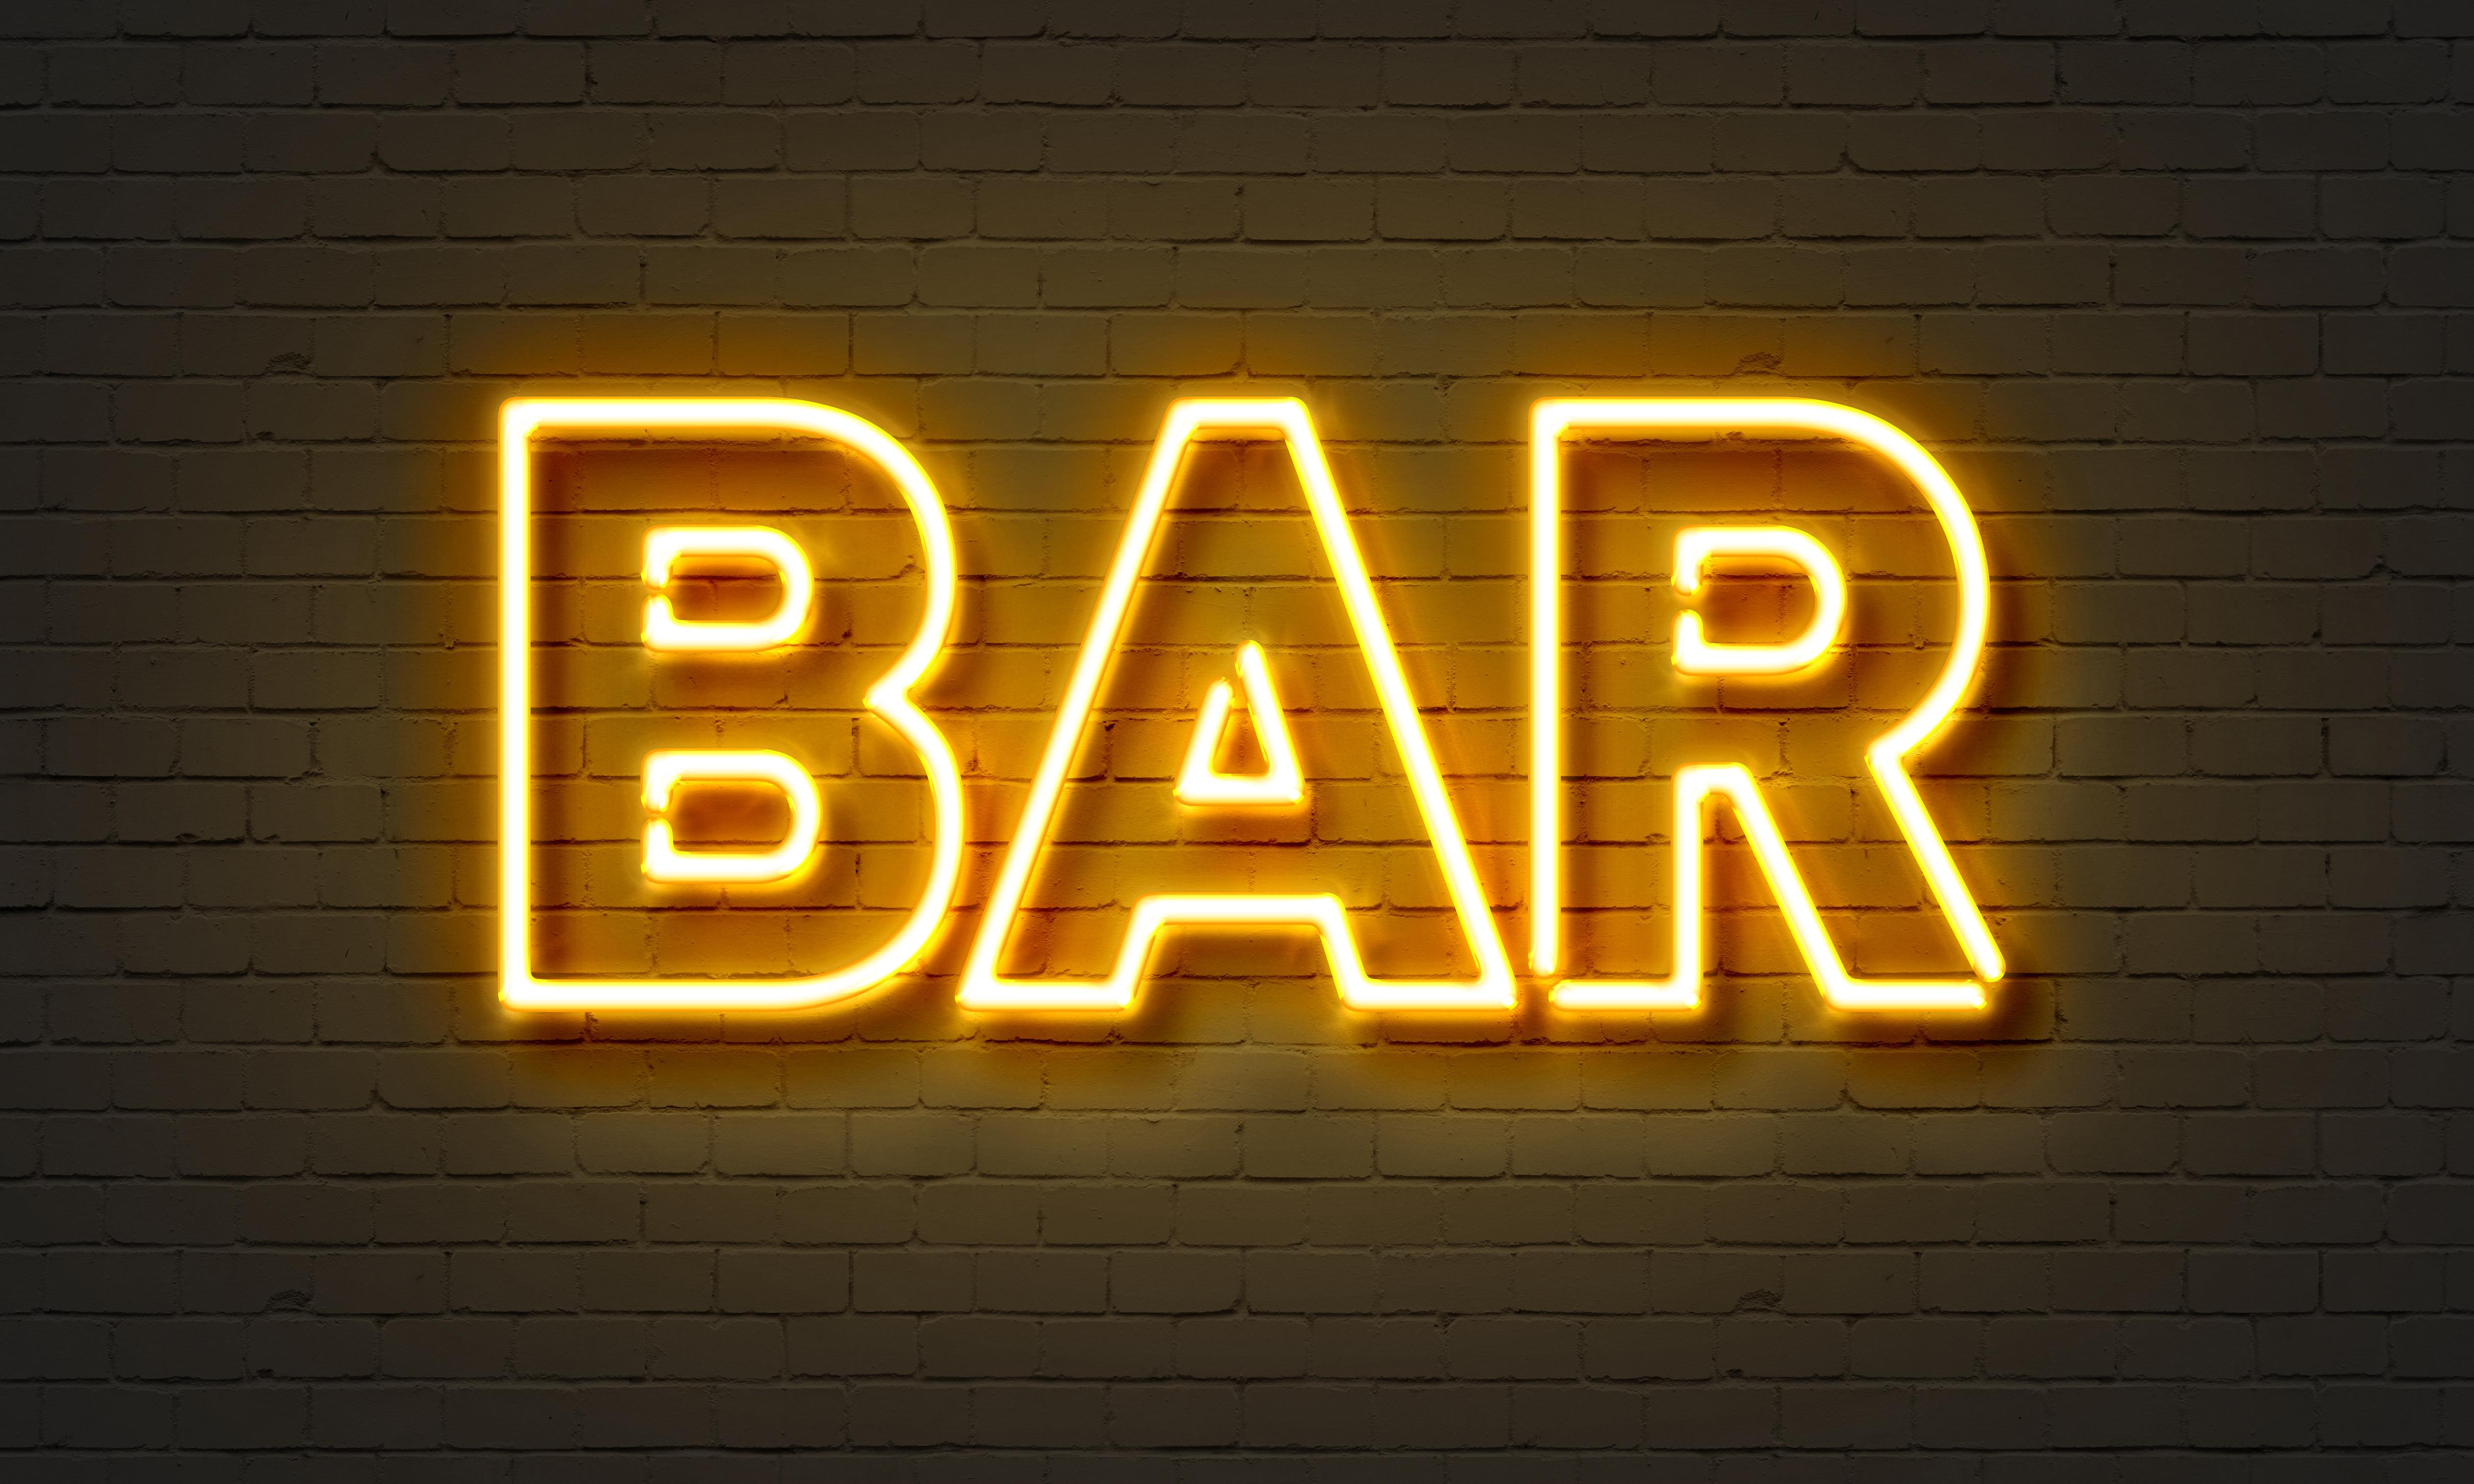 Bar neon sign - Custom Wallpaper